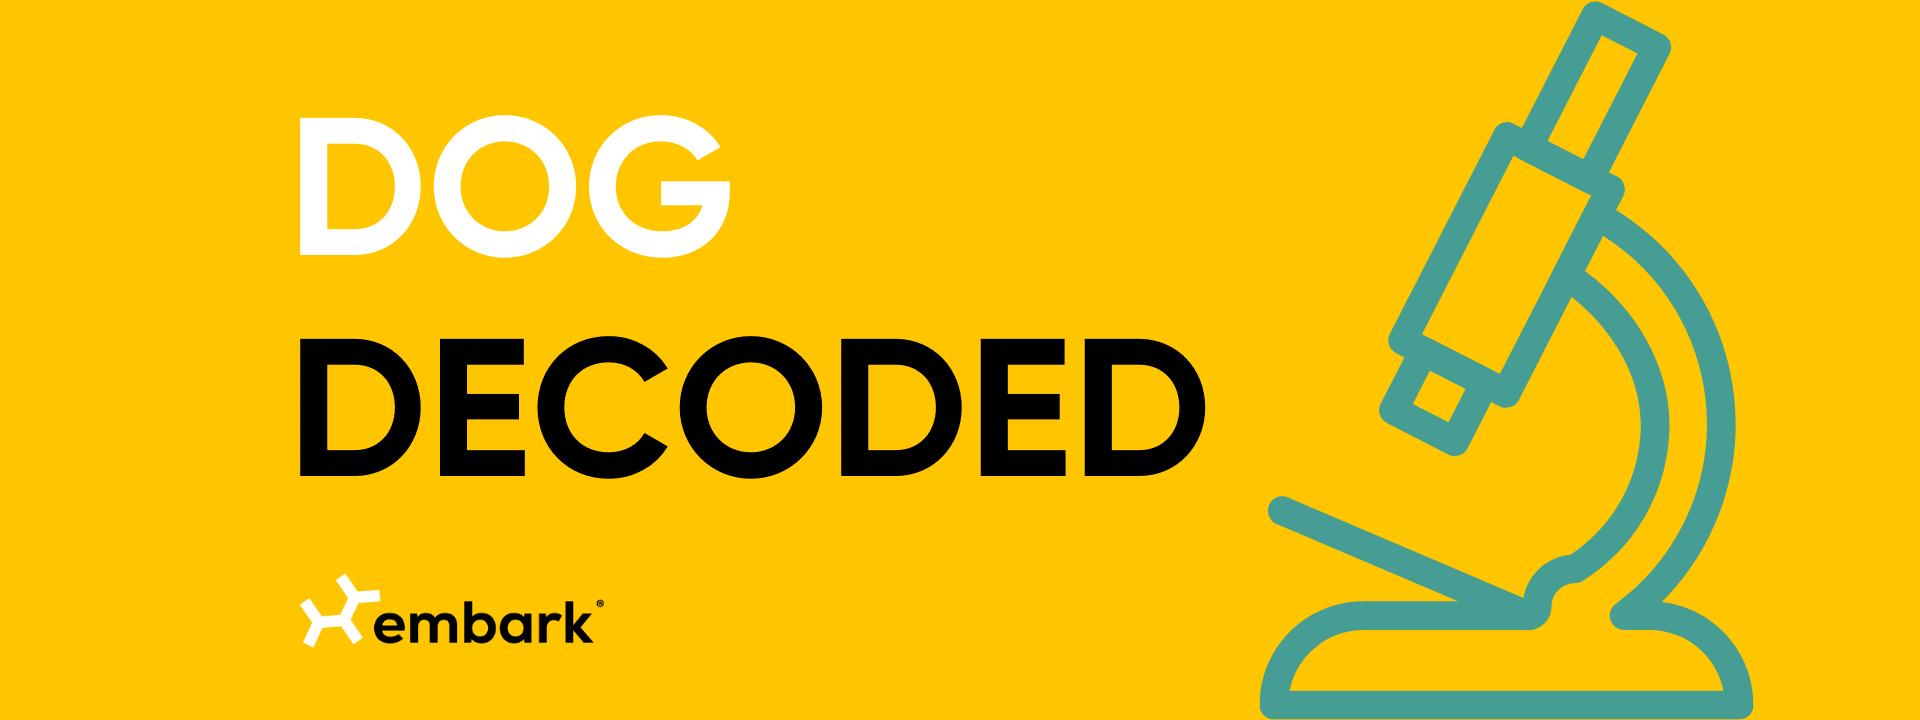 Dog Decoded Blog Header